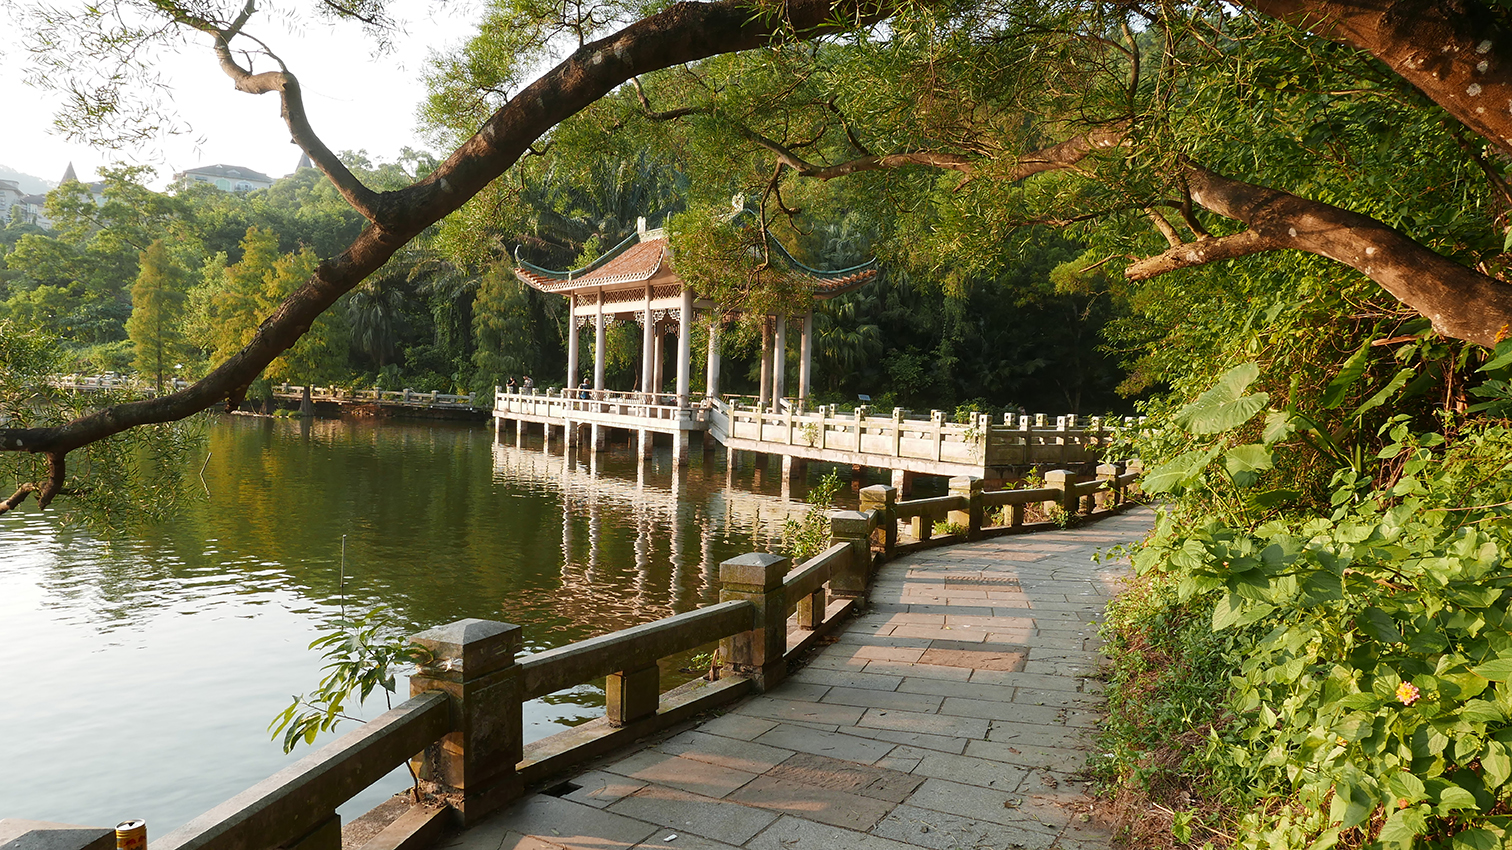 Silbersee, Shenzhen, China